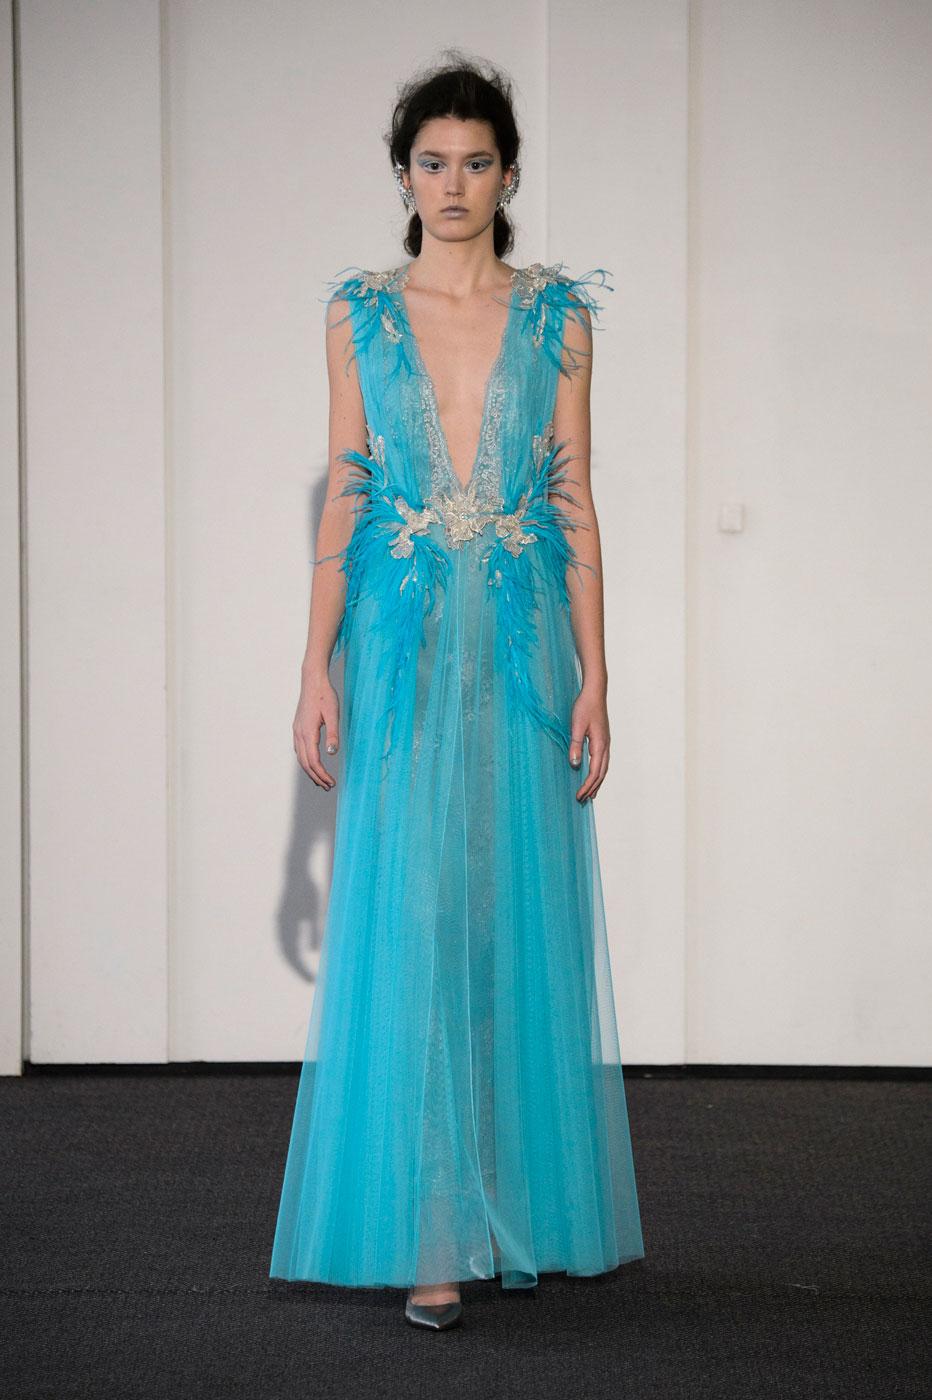 Busardi-fashion-runway-show-haute-couture-paris-spring-2015-the-impression-52